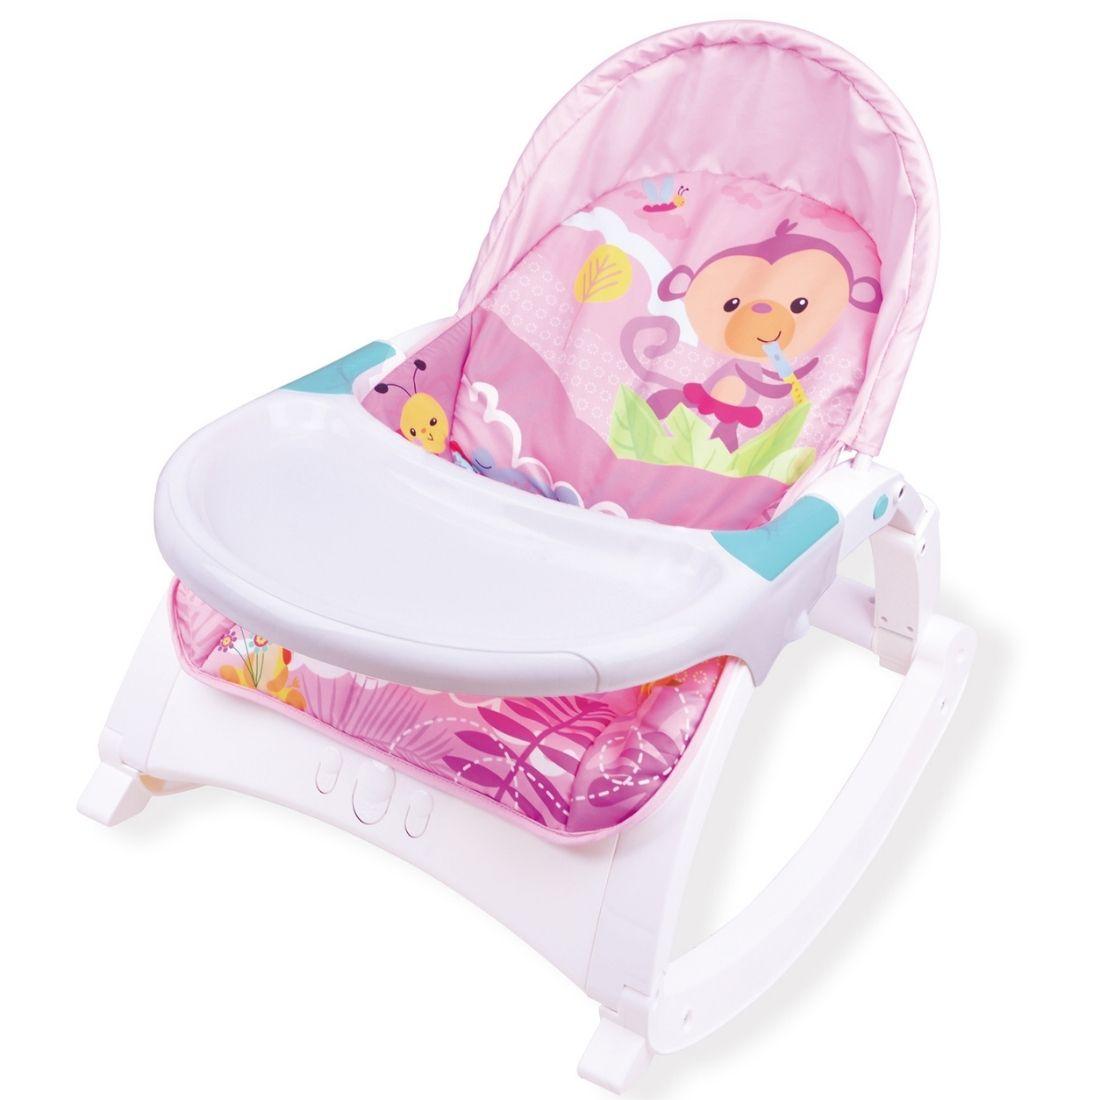 Cadeira de Descanso Bebê Alimentação Repouseira Baby Style Little - Rosa